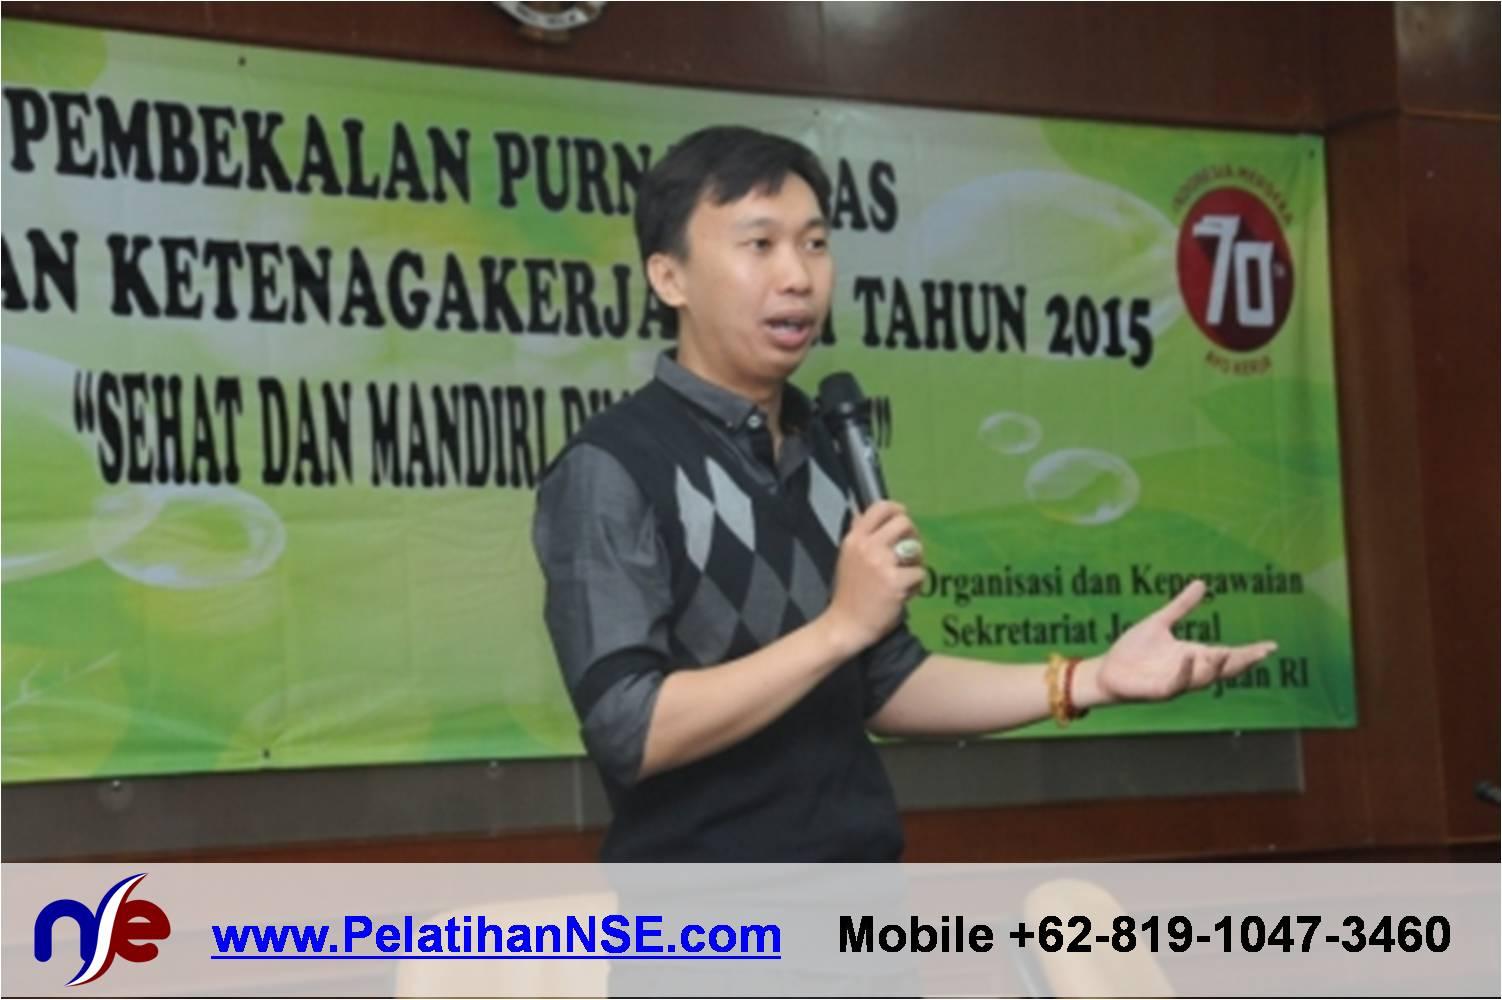 Retiree Empowerment - Kementerian Tenaga Kerja RI - Materi oleh Pak Haryadi